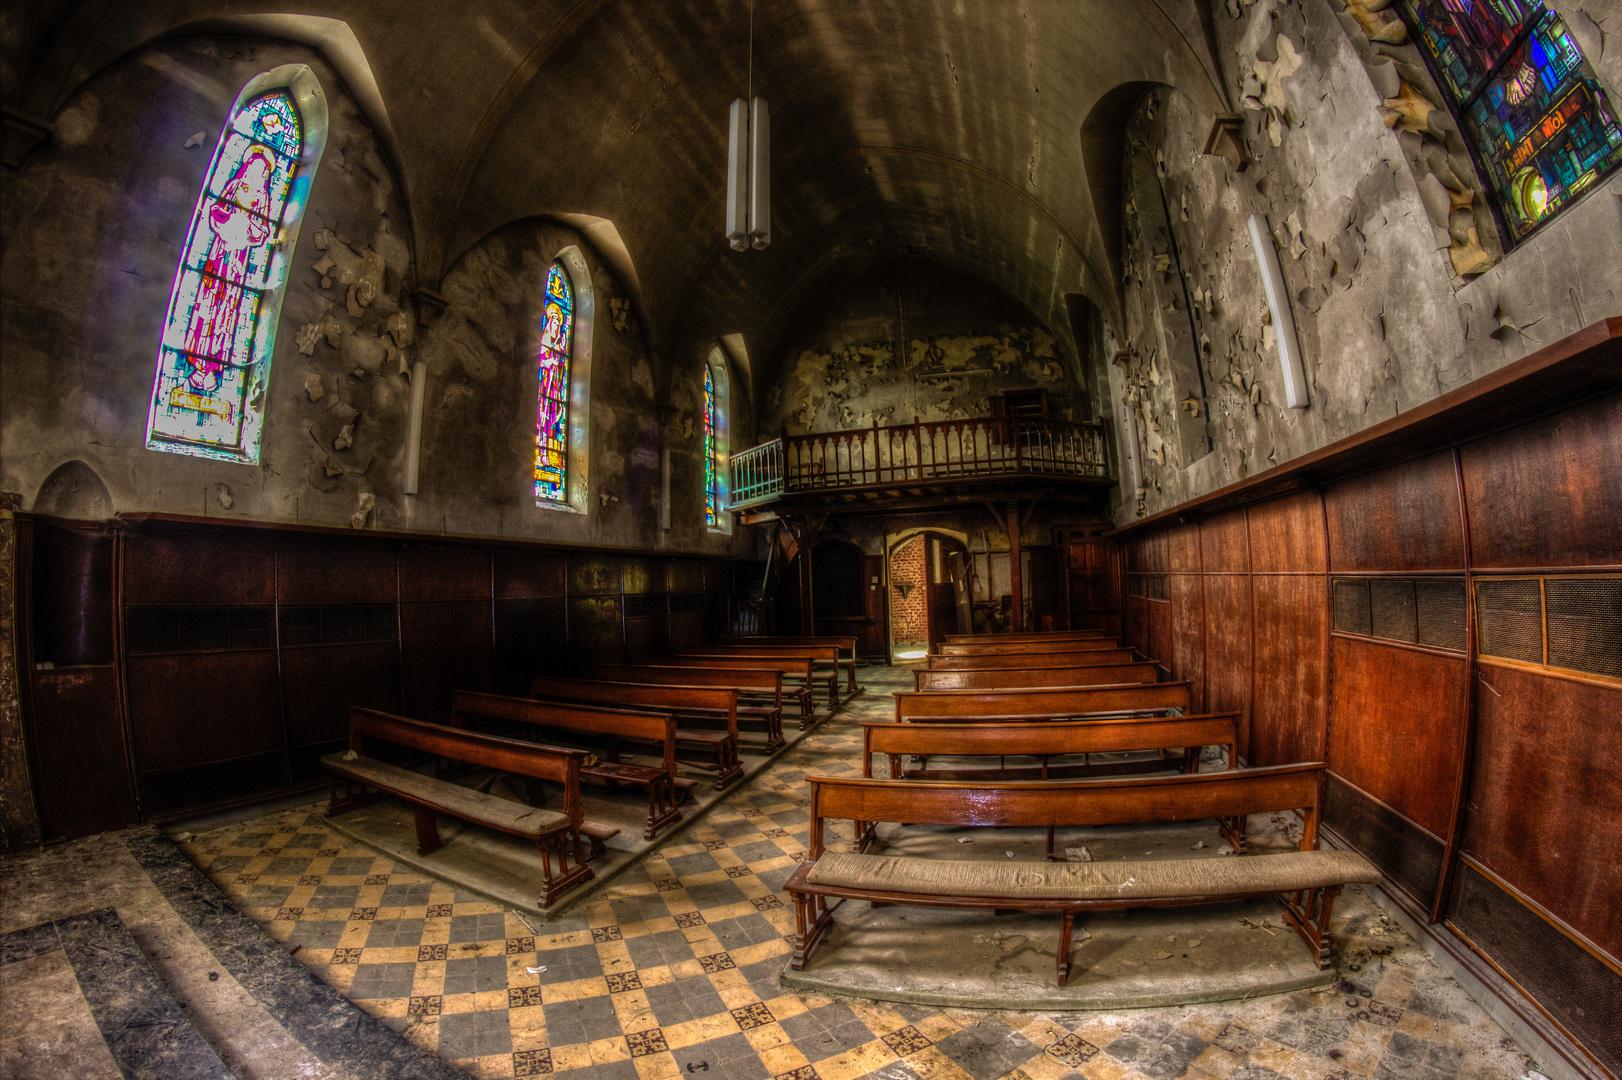 Eine verlassene Kirche in Belgien